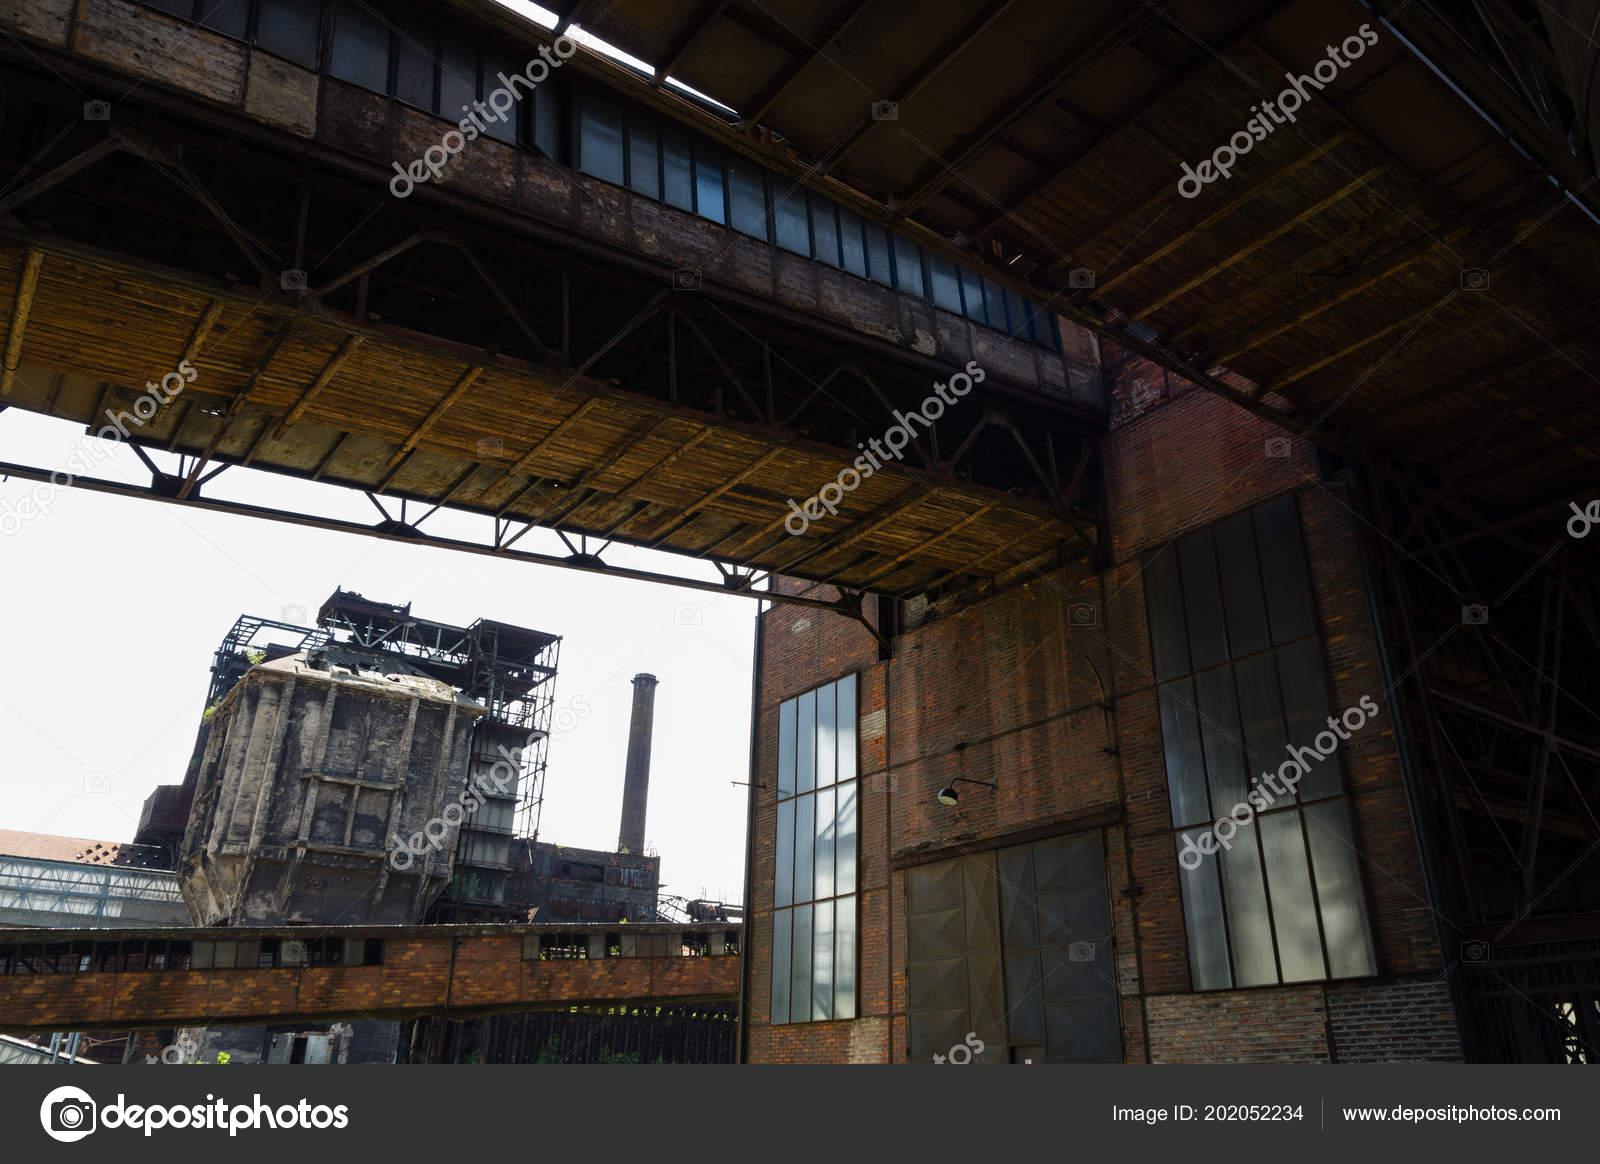 Abandoned Buildings Dolni Vitkovice Industrial Area Ostrava Czech Republic Stock Photo C Vidumg 202052234